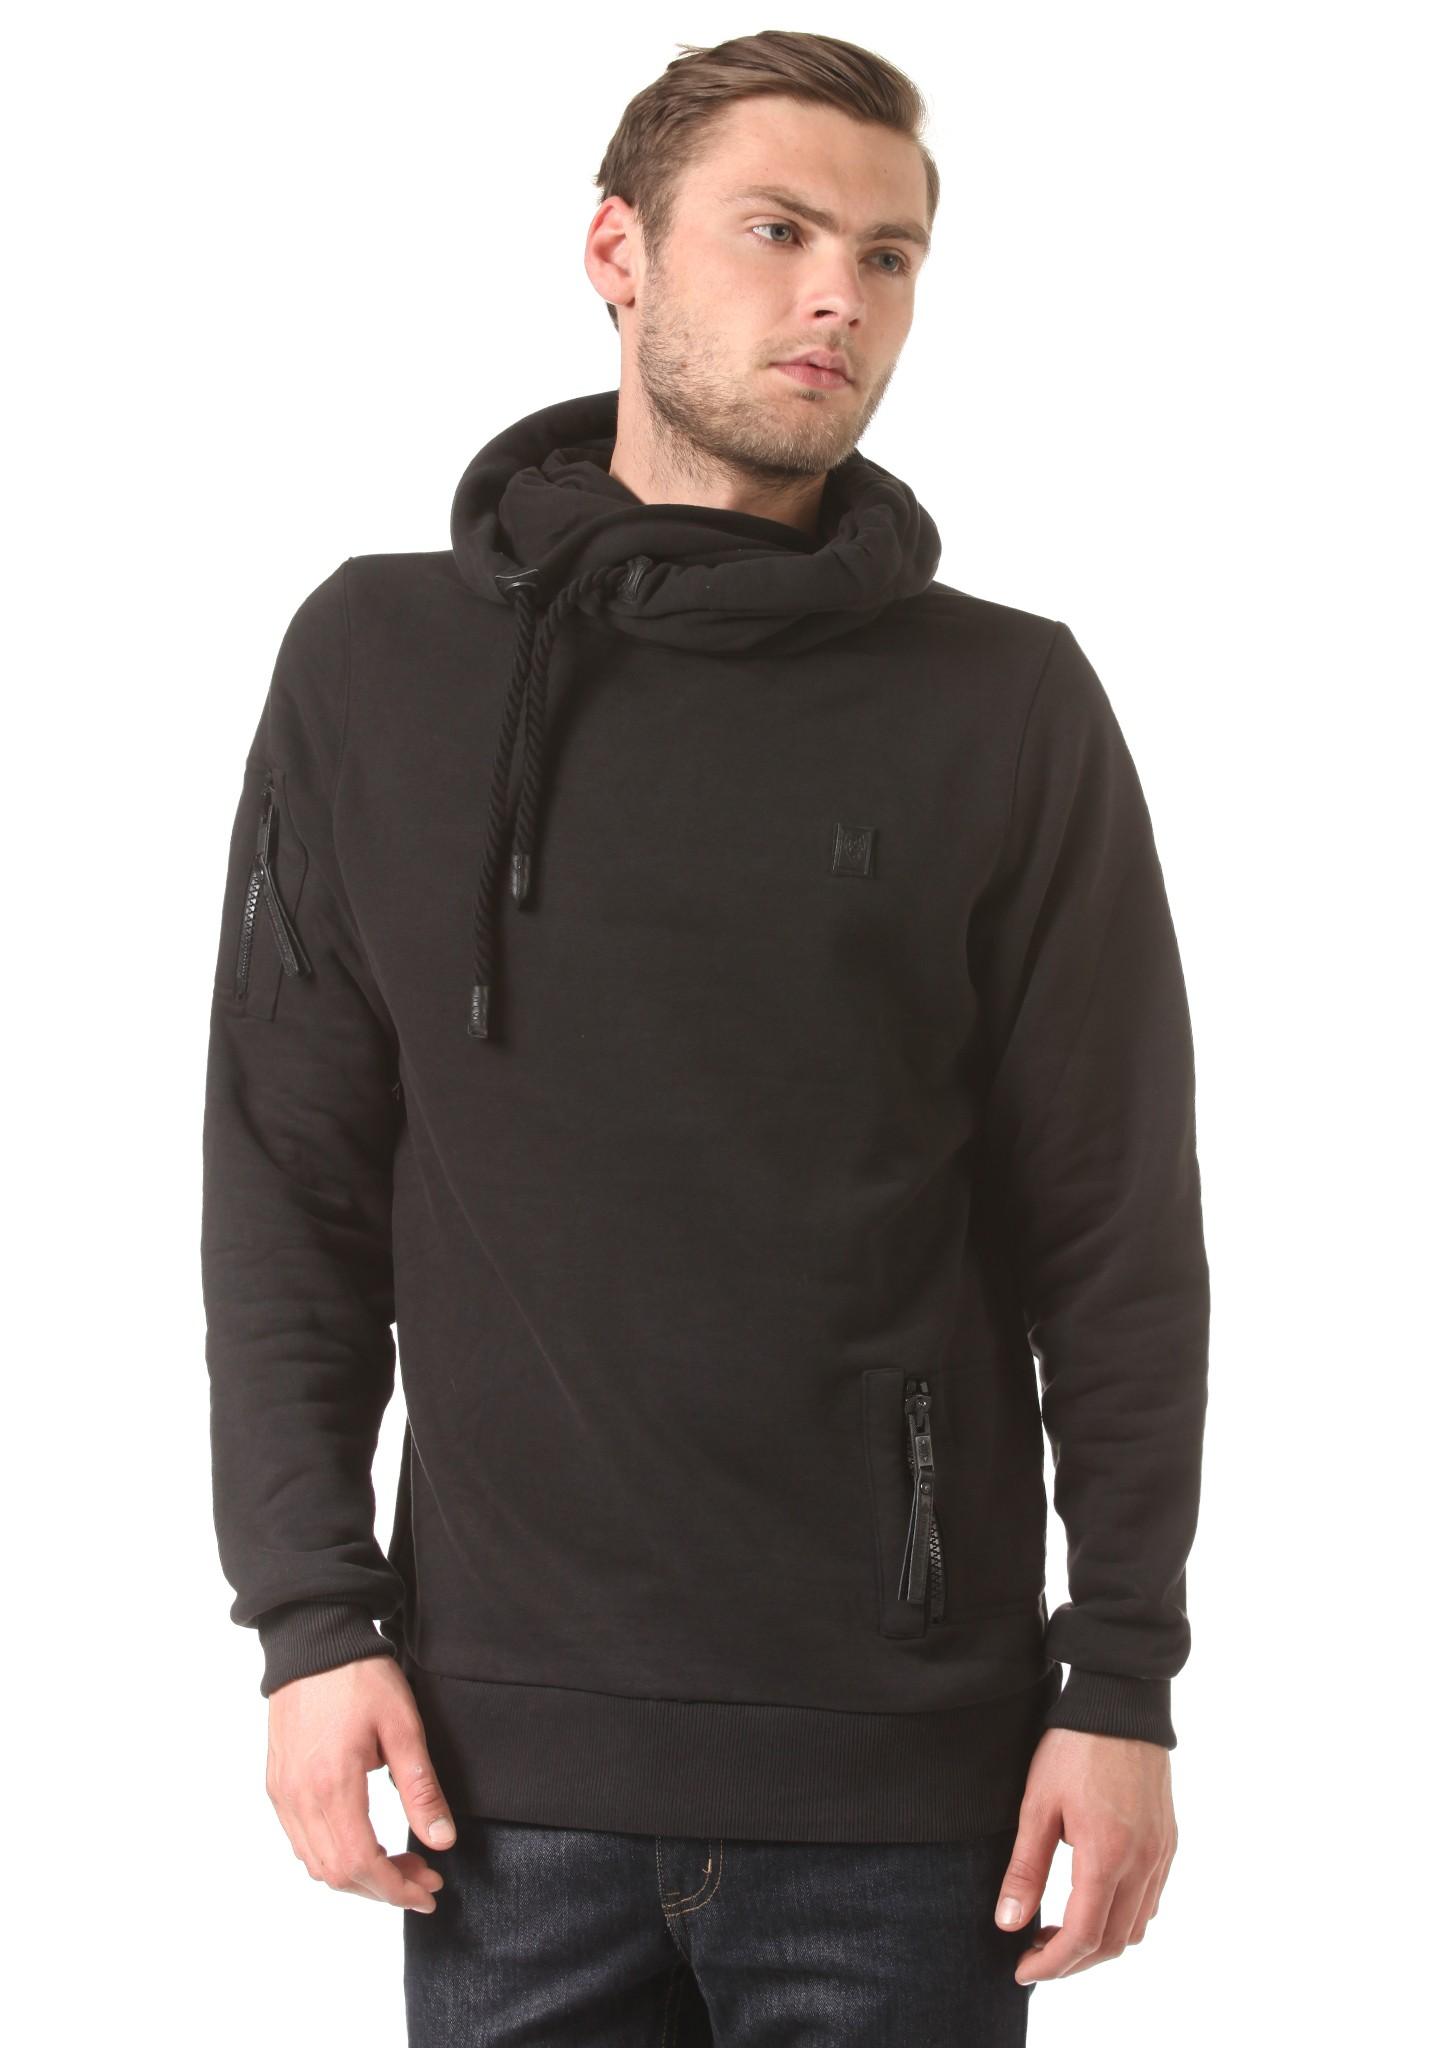 neu naketano pimp herren kapuzenpullover pullover hoodie kapuzenjacke ebay. Black Bedroom Furniture Sets. Home Design Ideas